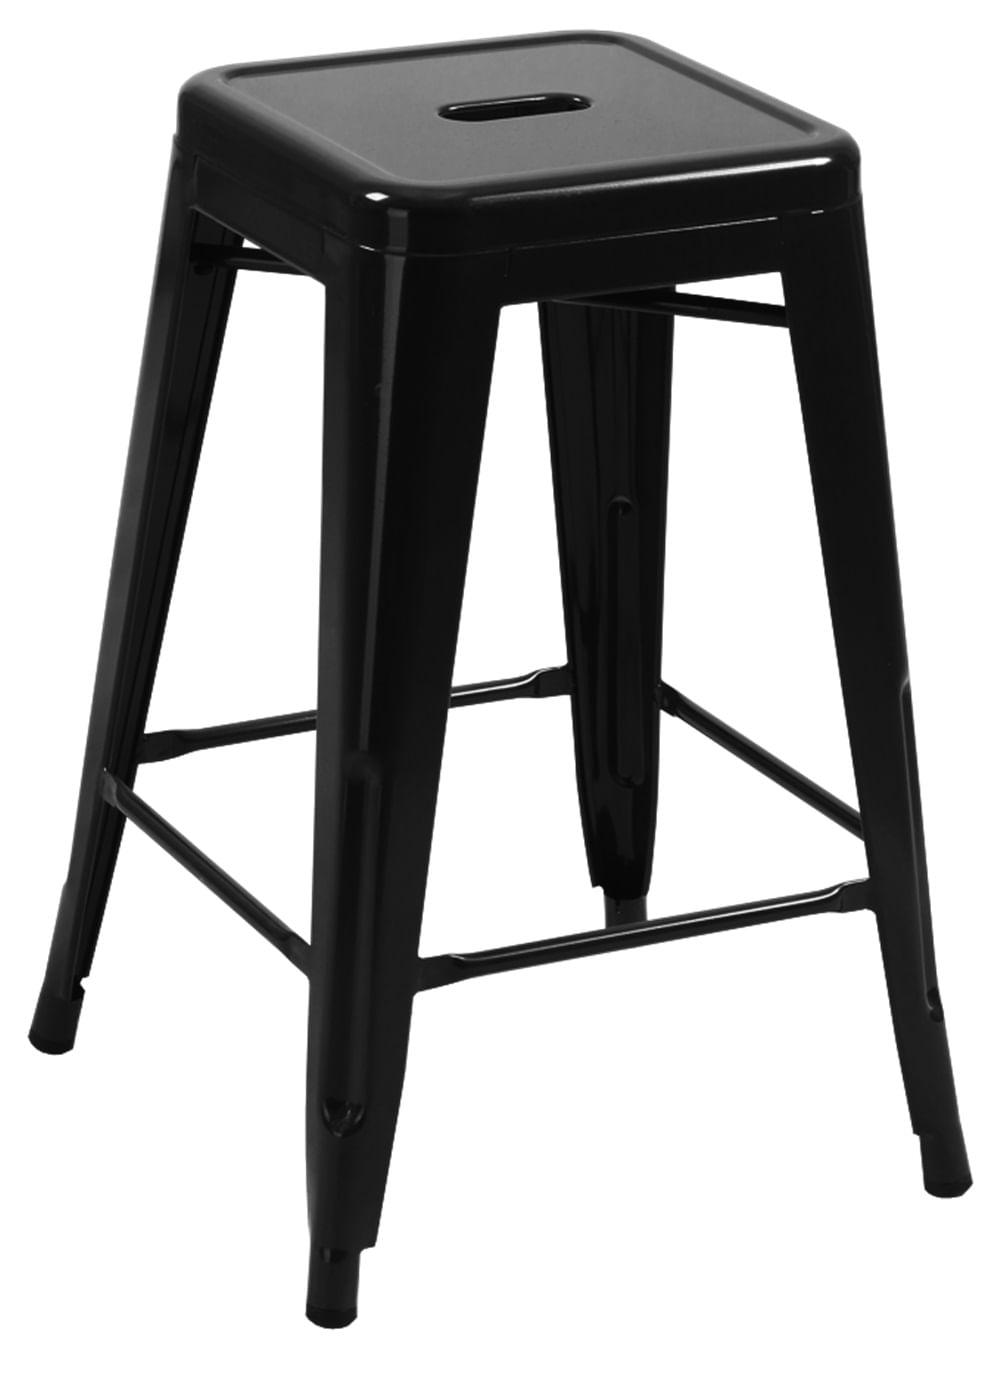 Banqueta Industrial Iron Preta Media 67 cm (ALT) - 24880